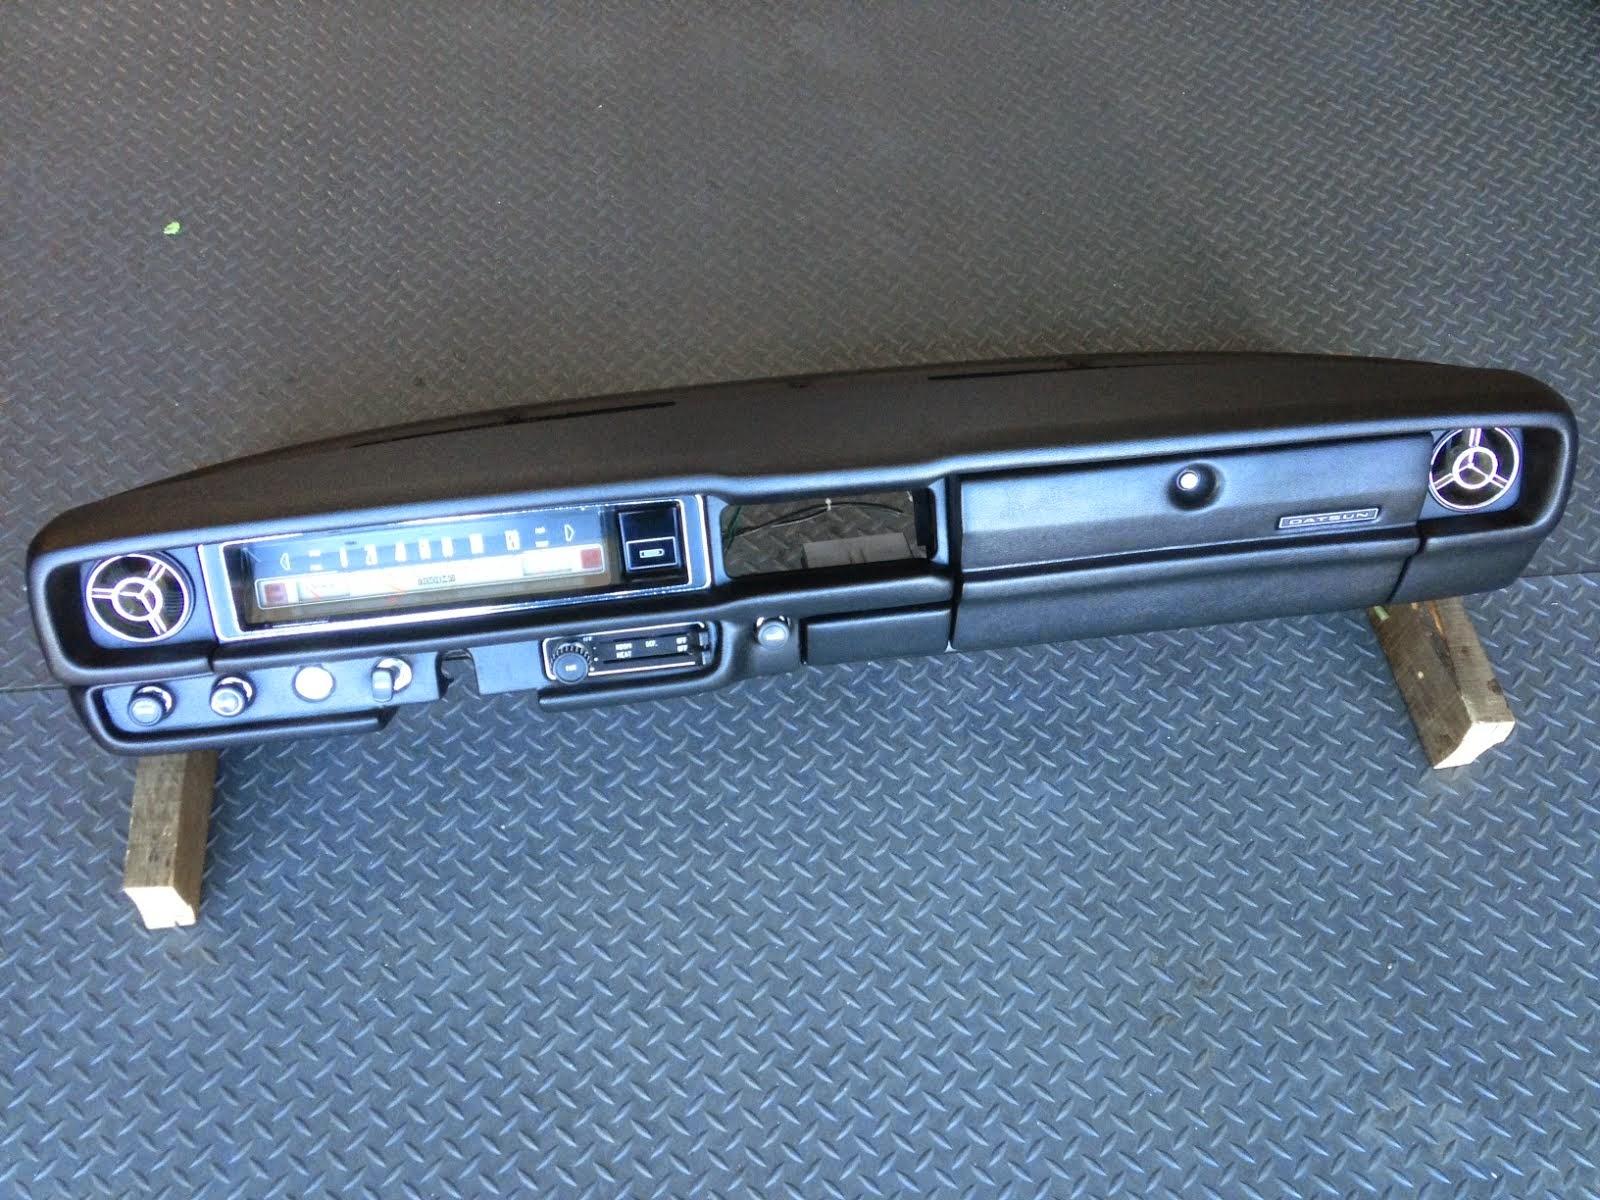 1969 firebird dash wiring diagram venn dna and rna 1967 belvedere parts